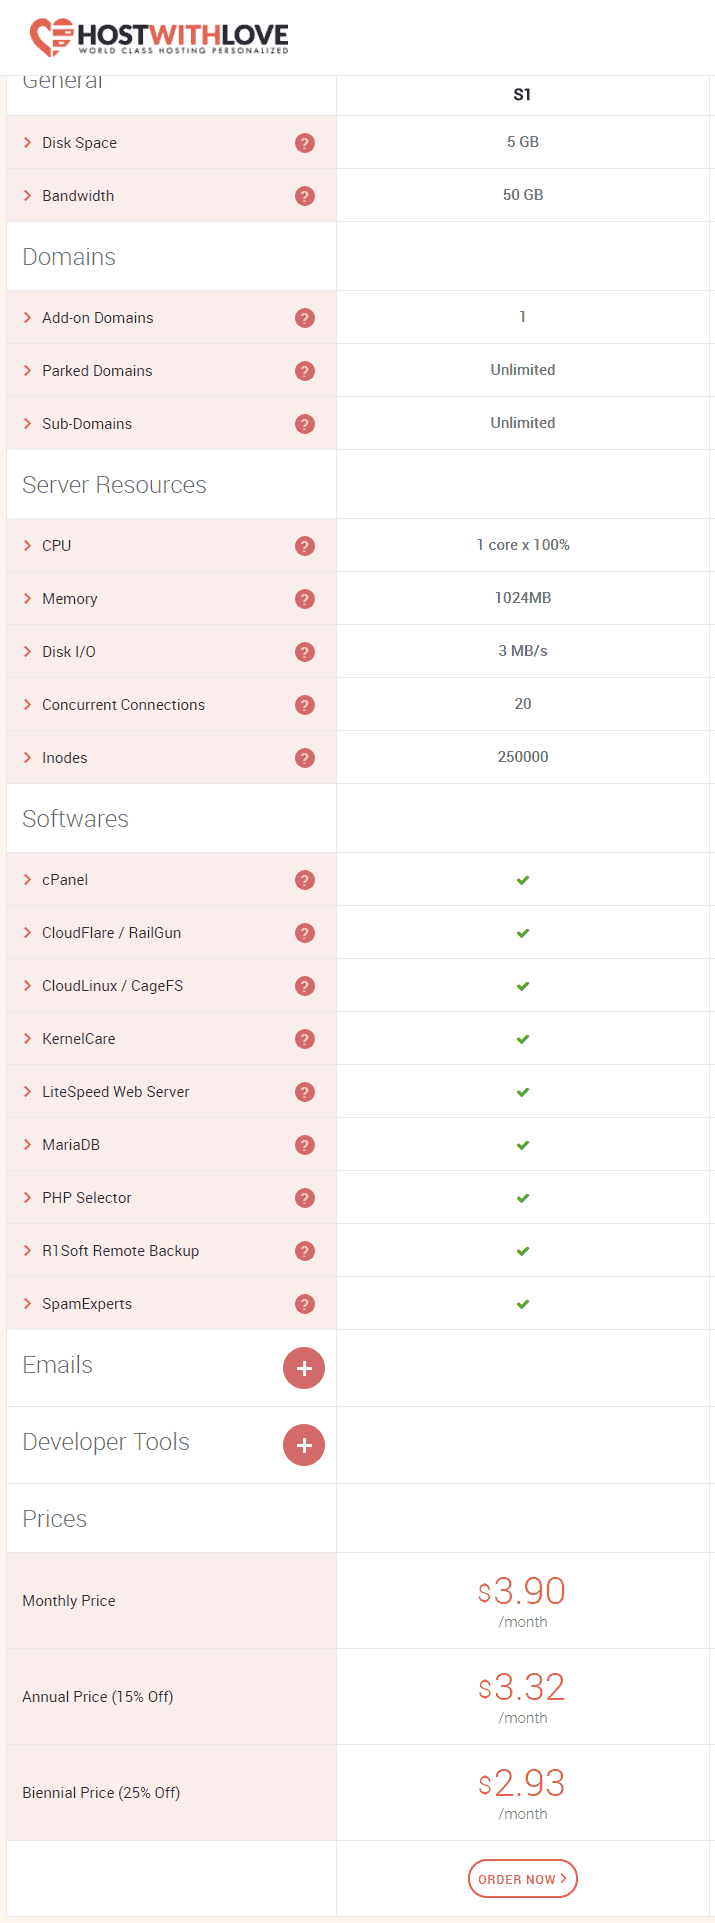 Best cheap wordpress hosting web hosting comparison 2018 hostwithlovebestcheapwordpresshosting2018 best cheap wordpress hosting web hosting comparison 2018 blog xflitez Image collections